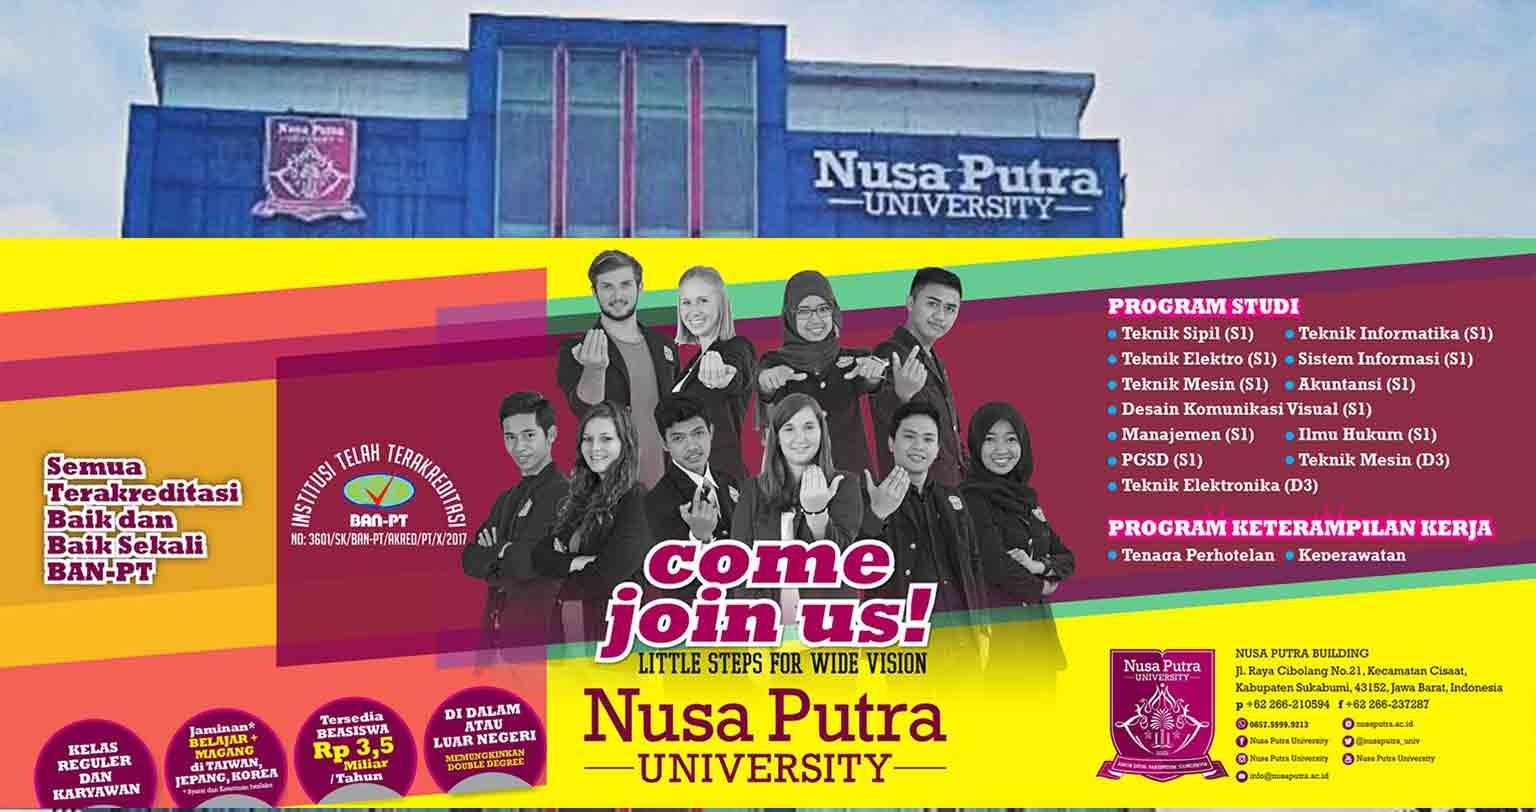 Nusa Putra University | LinkedIn